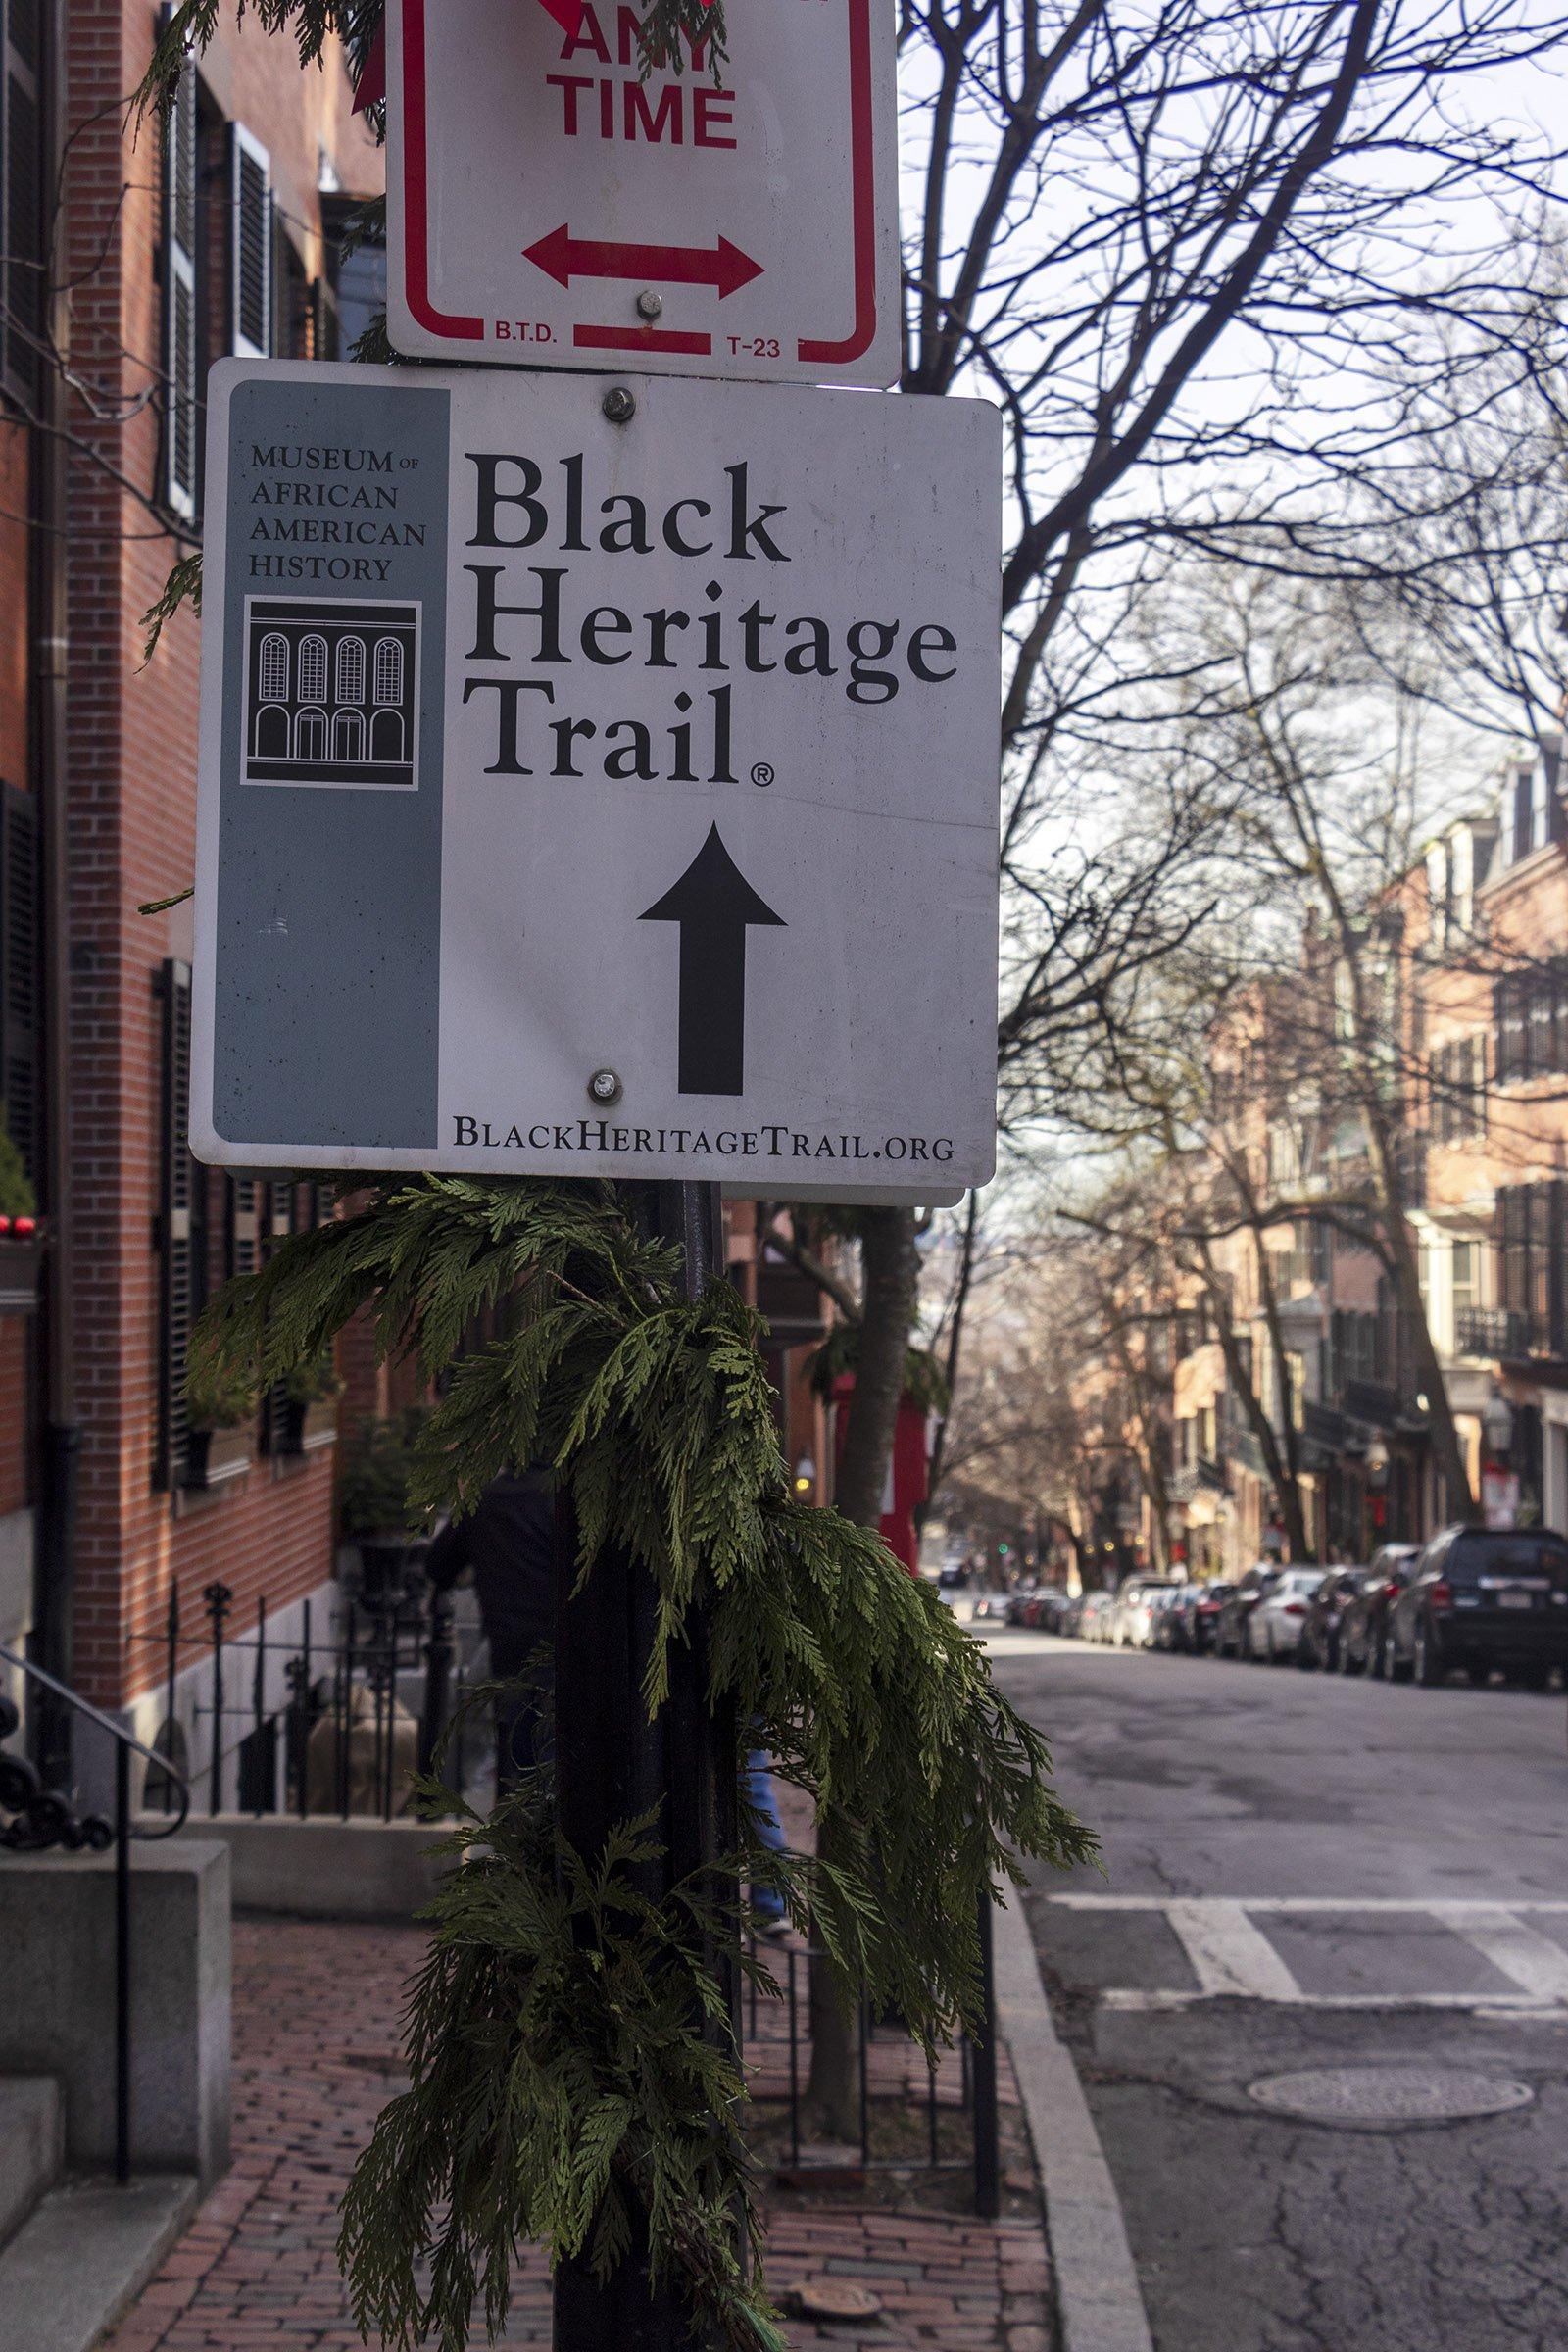 Black Heritage Trail Boston sign